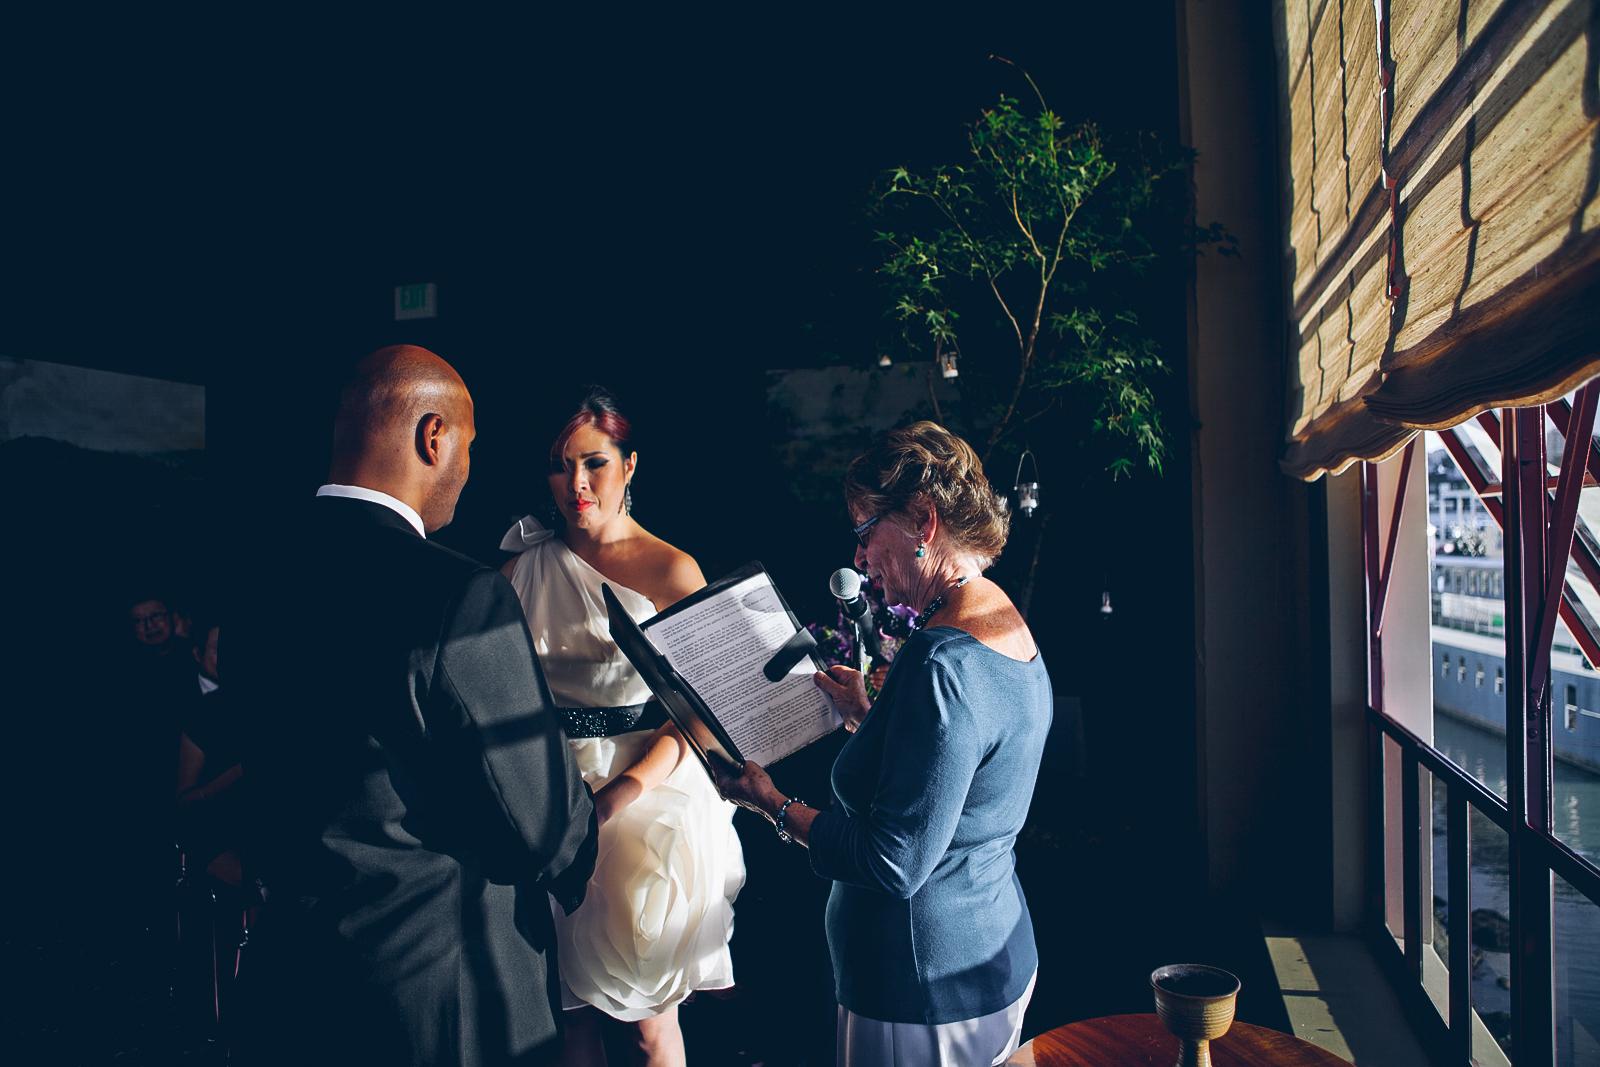 greens_restaurant_wedding_photography_san_franscisco_ebony_siovhan_bokeh_photography_39.jpg